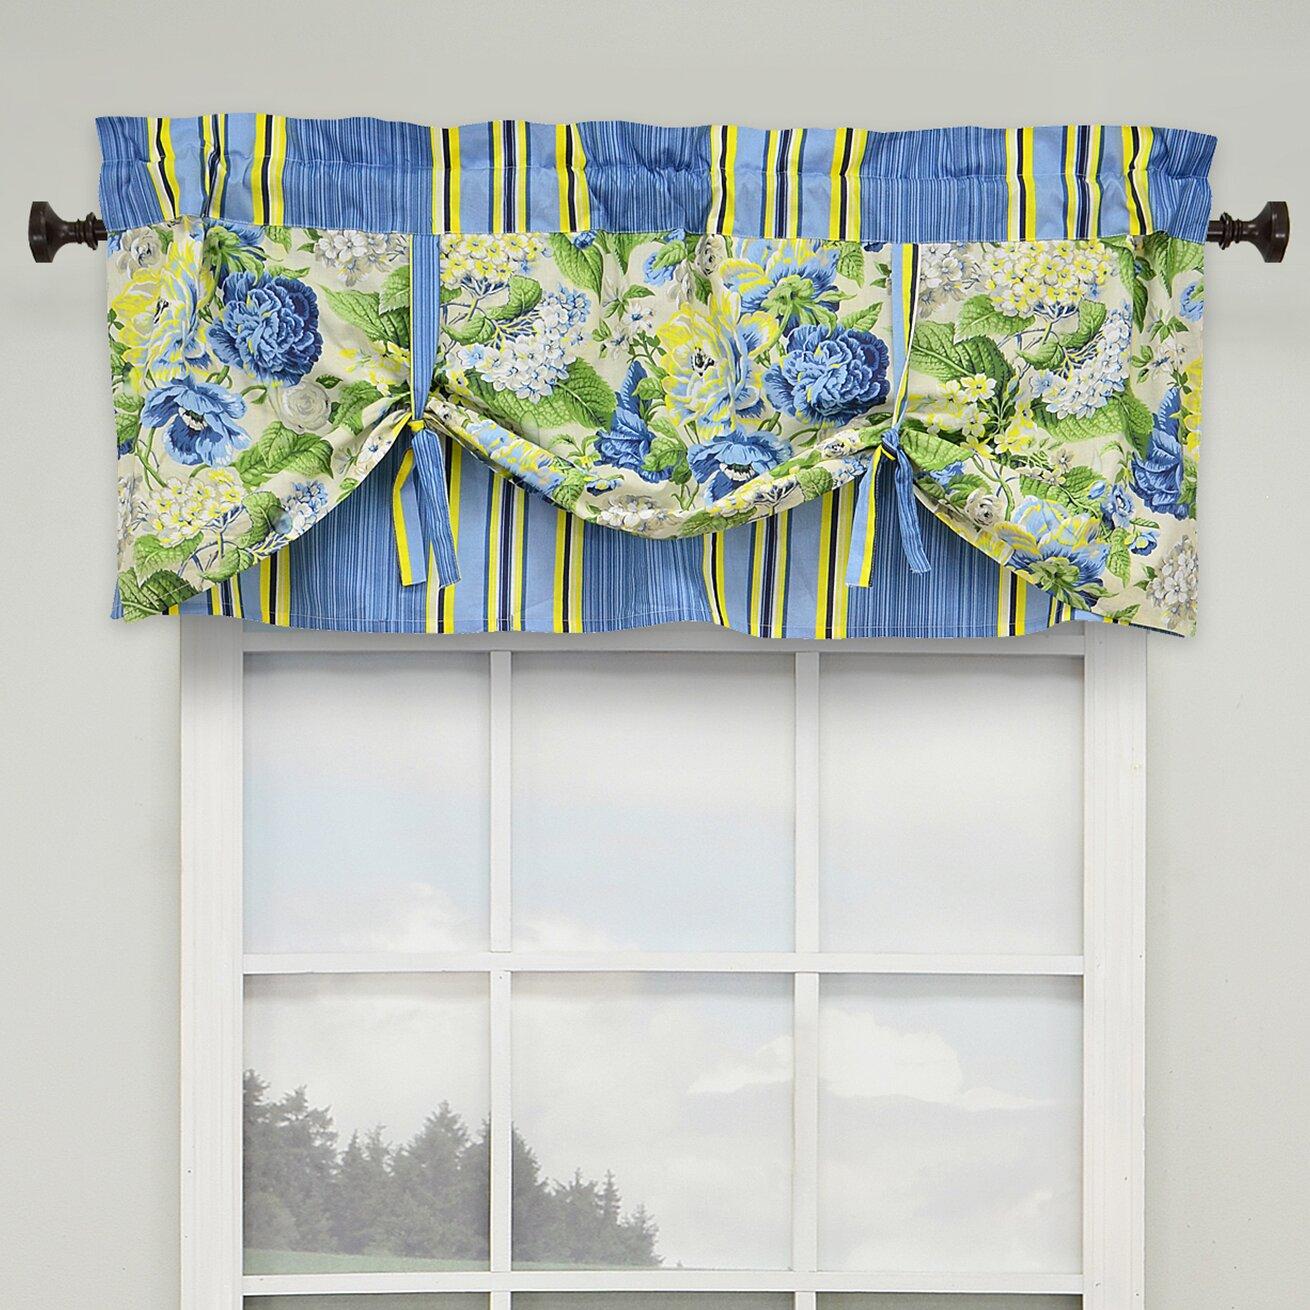 "Floral Flourish 52"" Lined Window Curtain Valance"